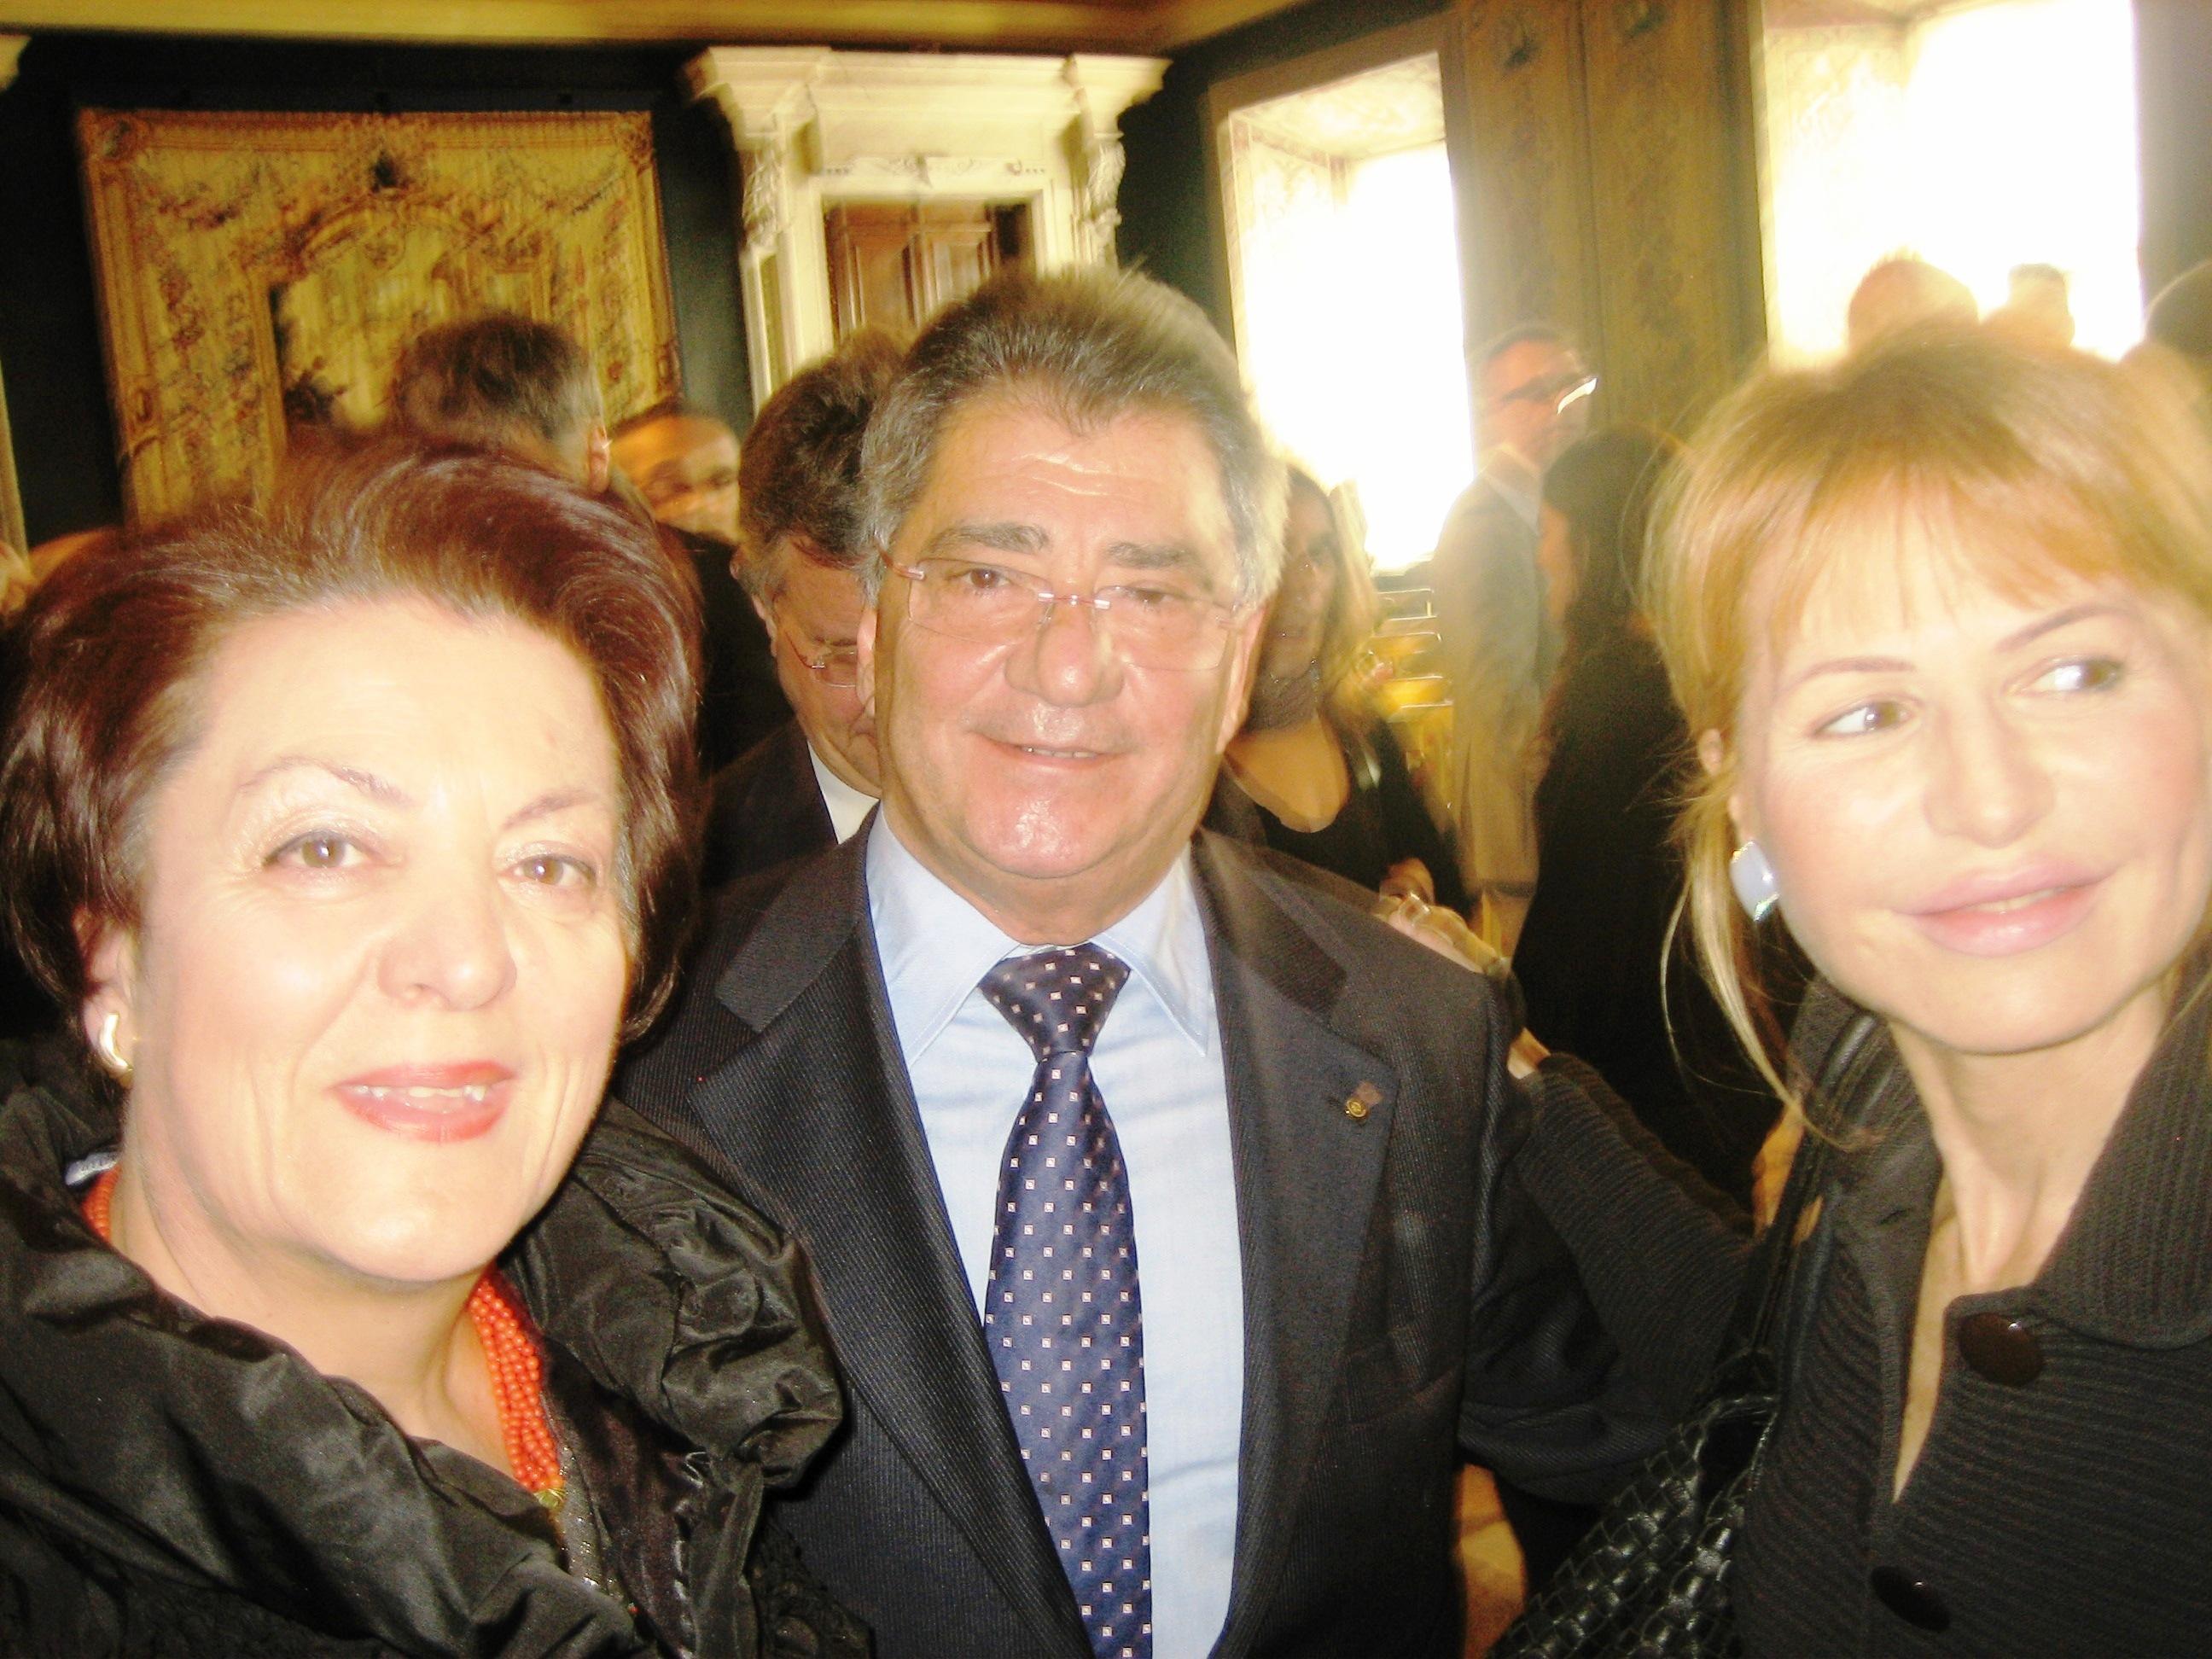 2011 Quirinale Lilli Gruber, G.Savino sindaco, Rosa Tomasone